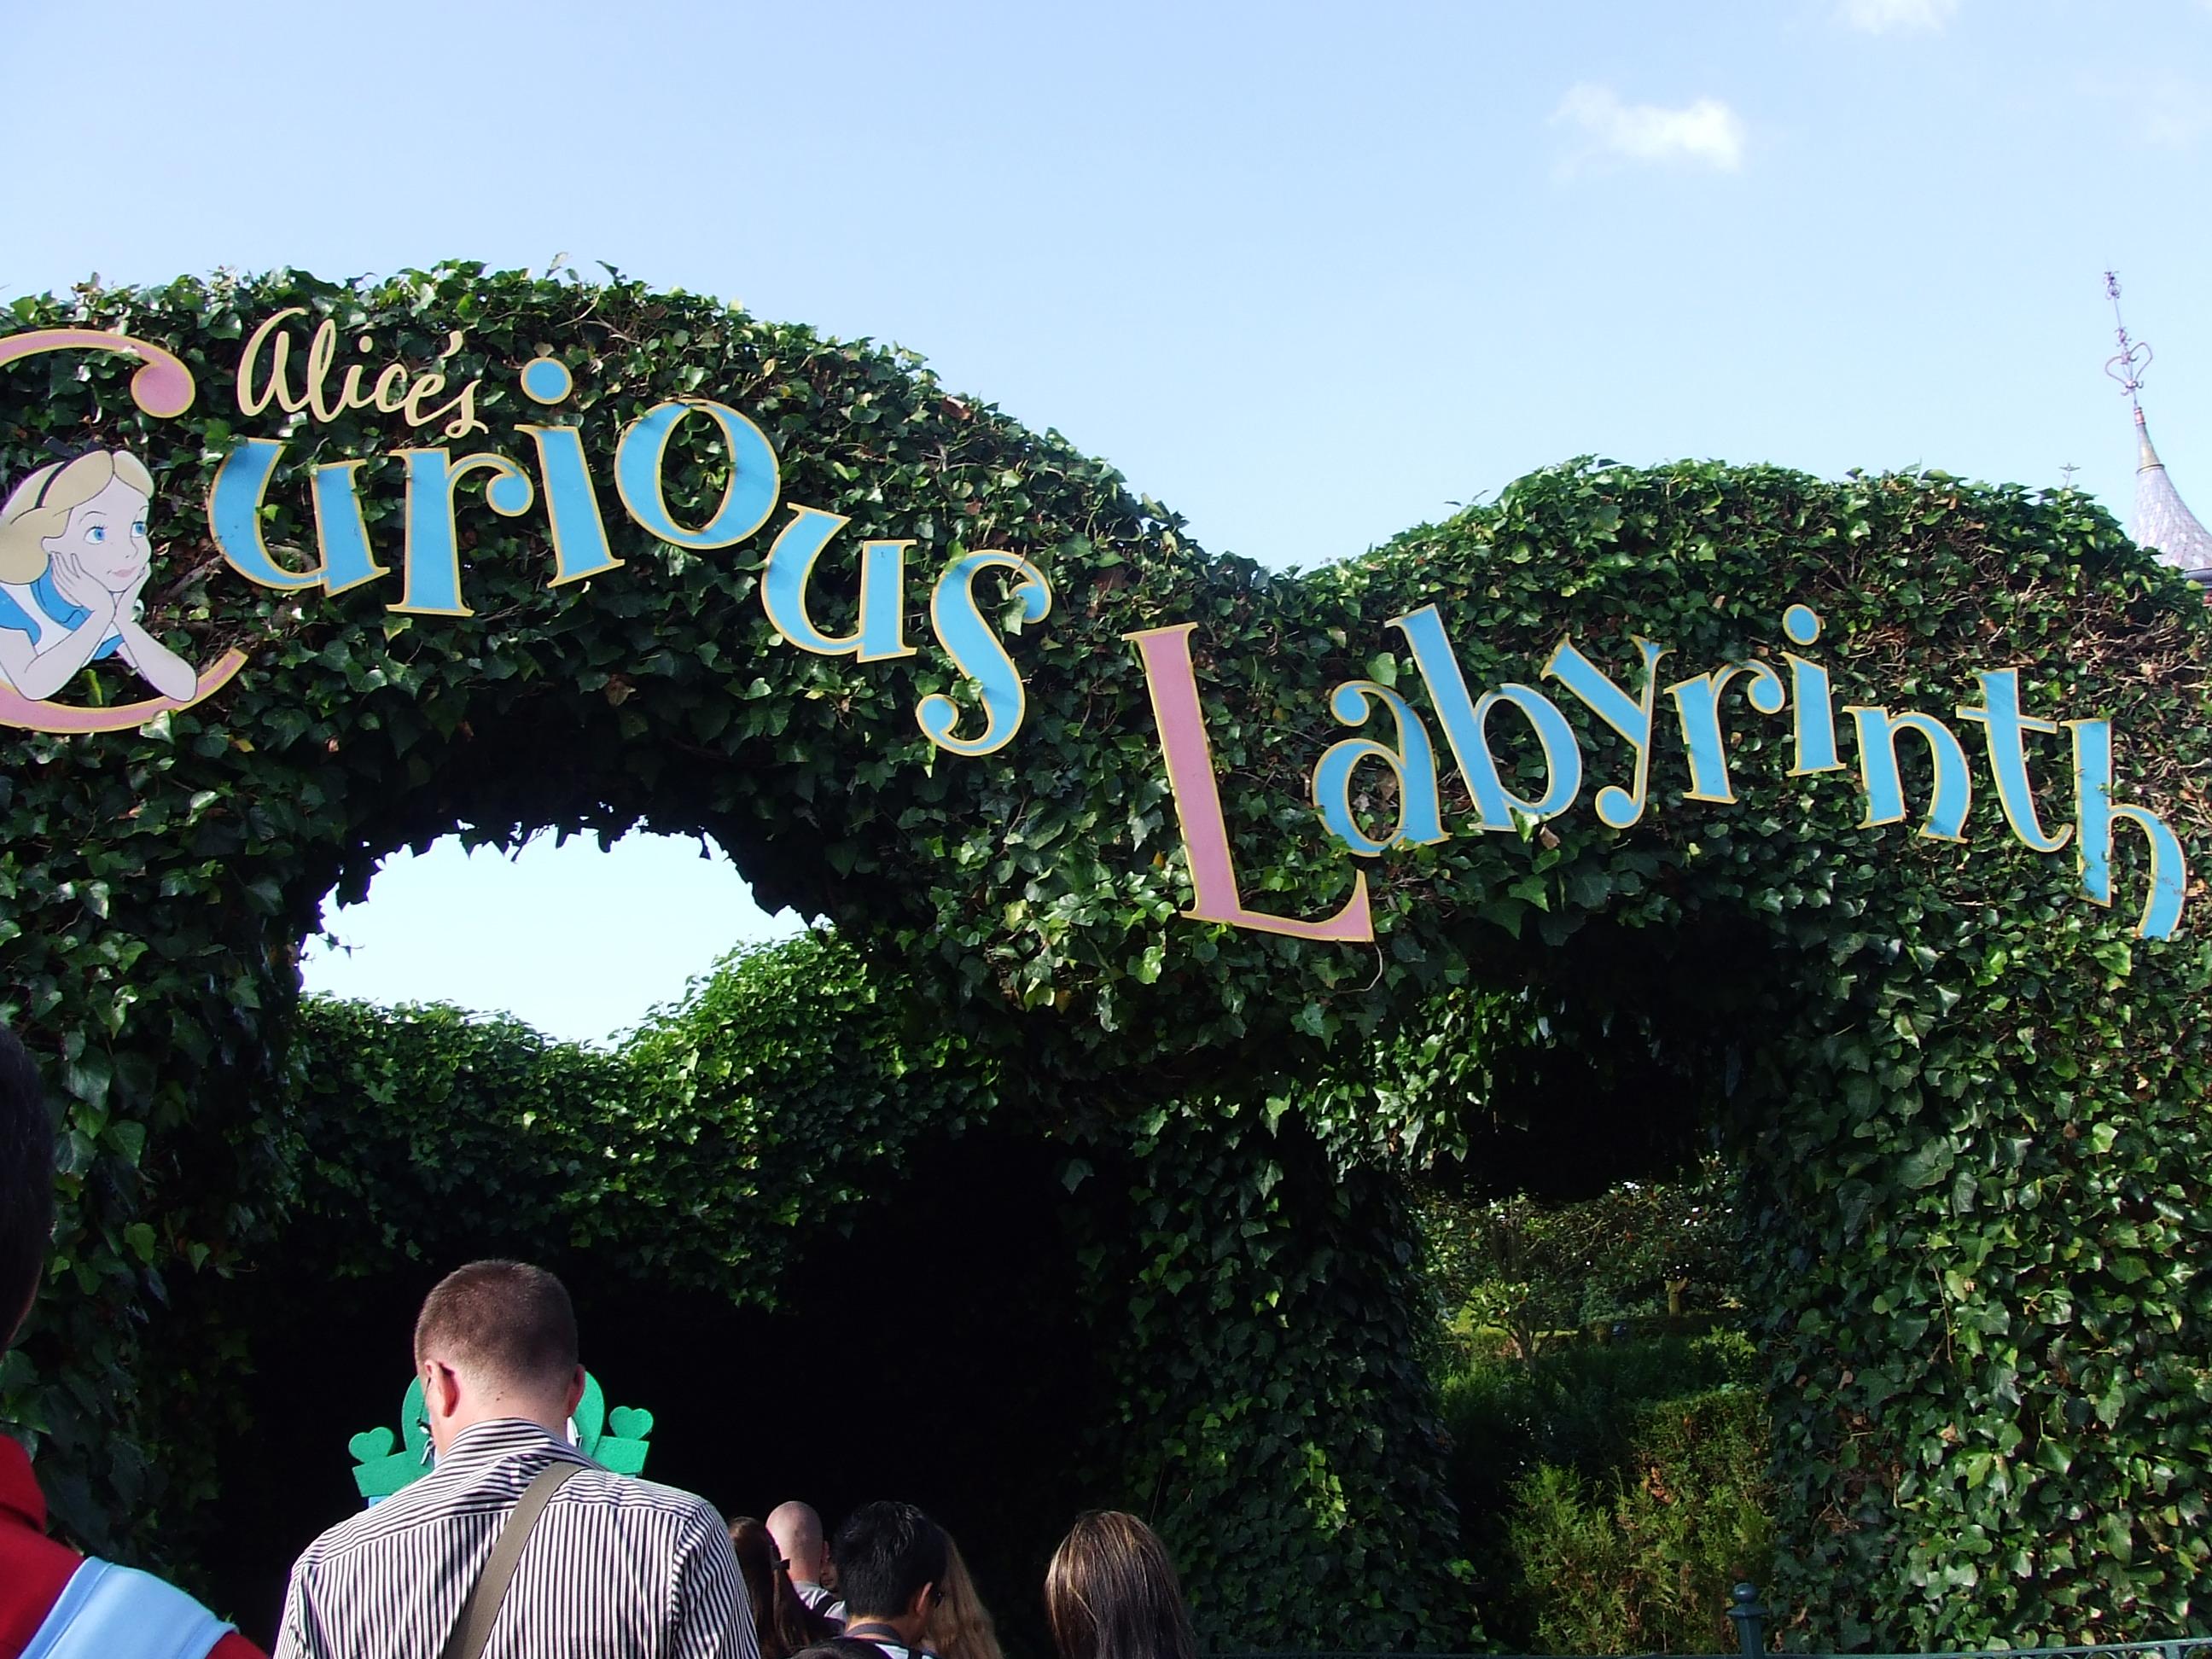 Alice S Curious Labyrinth Wikipédia